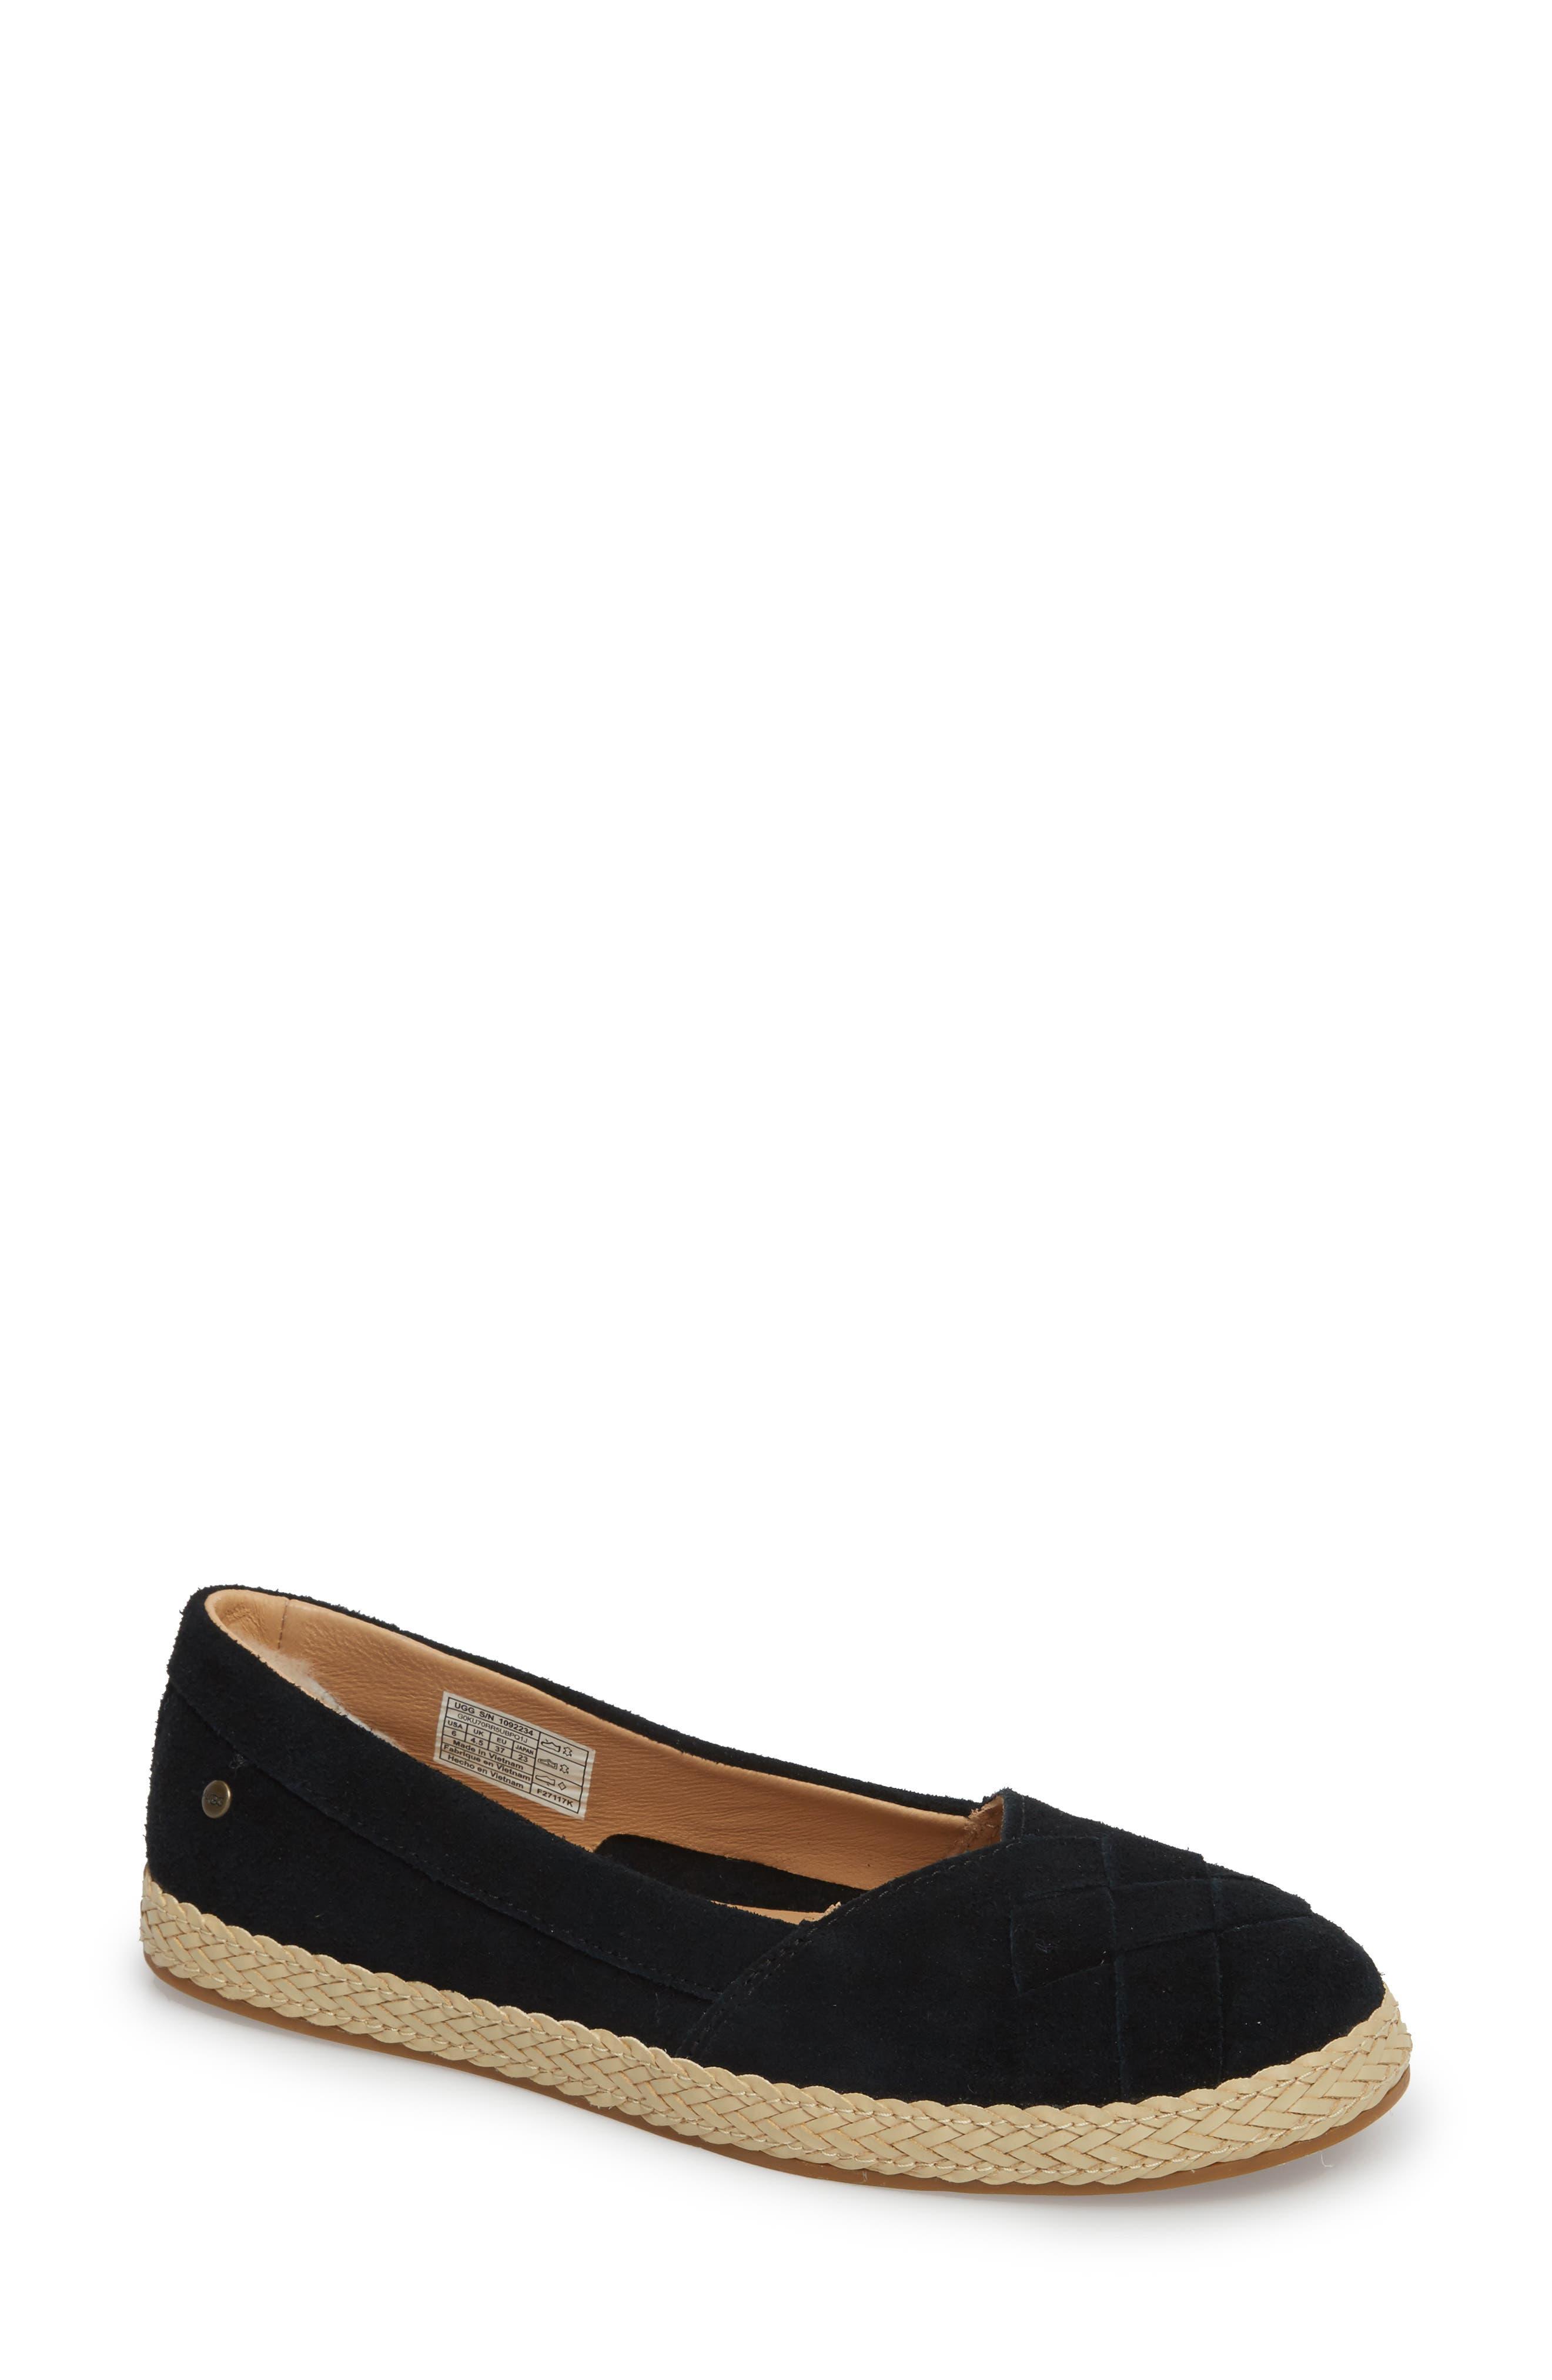 Clarissa Flat,                         Main,                         color, BLACK SUEDE